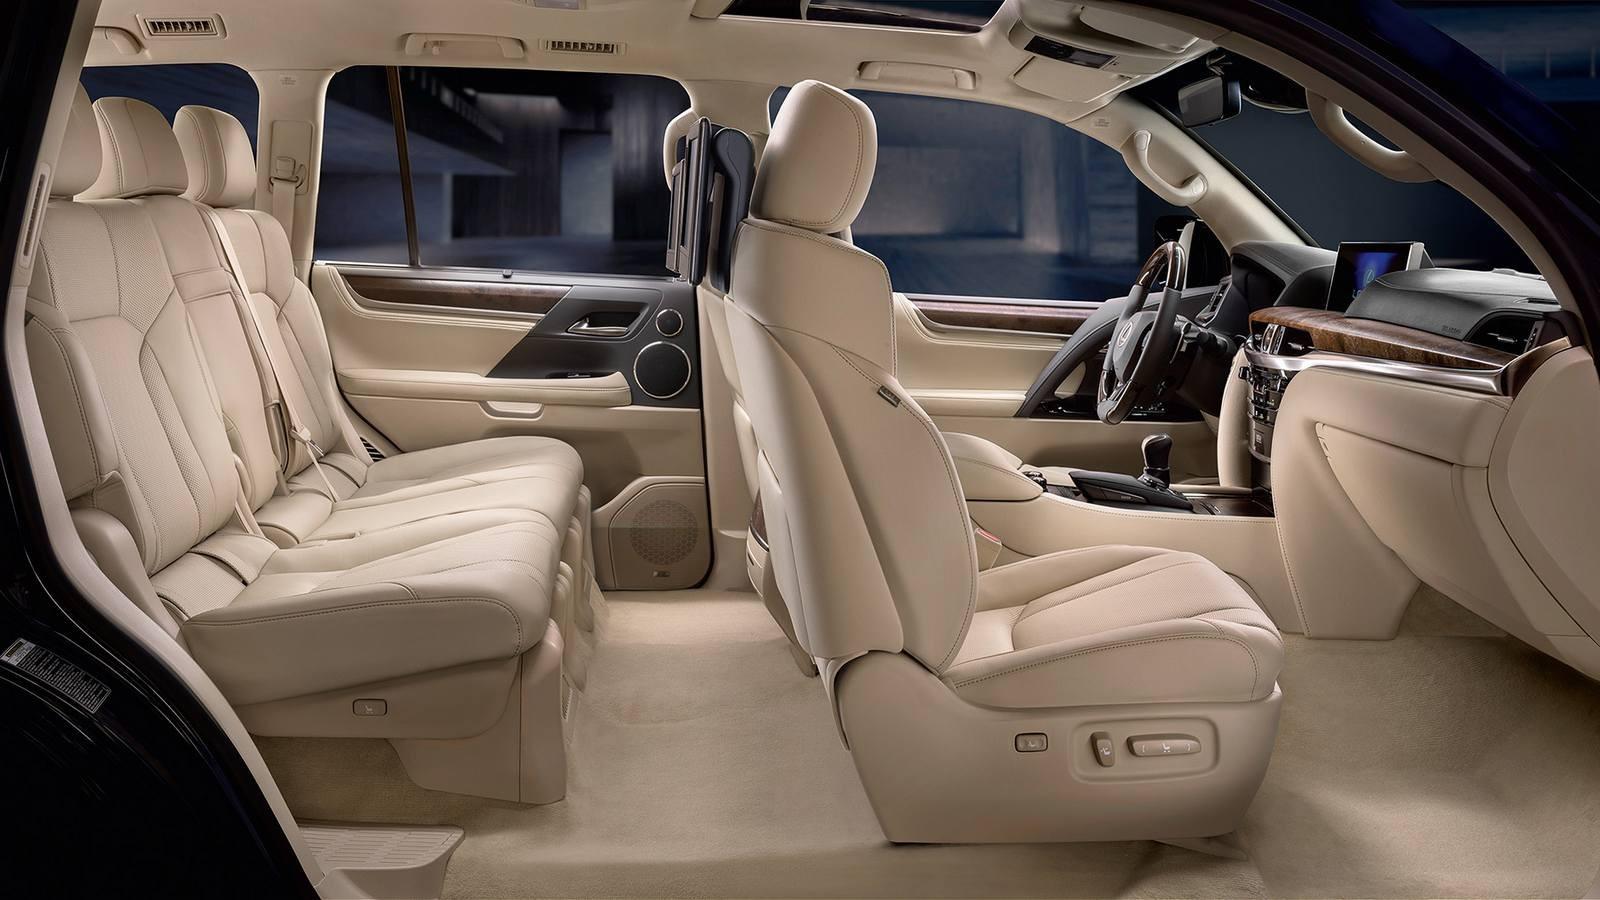 BMW X4 (F26) характеристики, двигатели, рестайлинг и комплектации